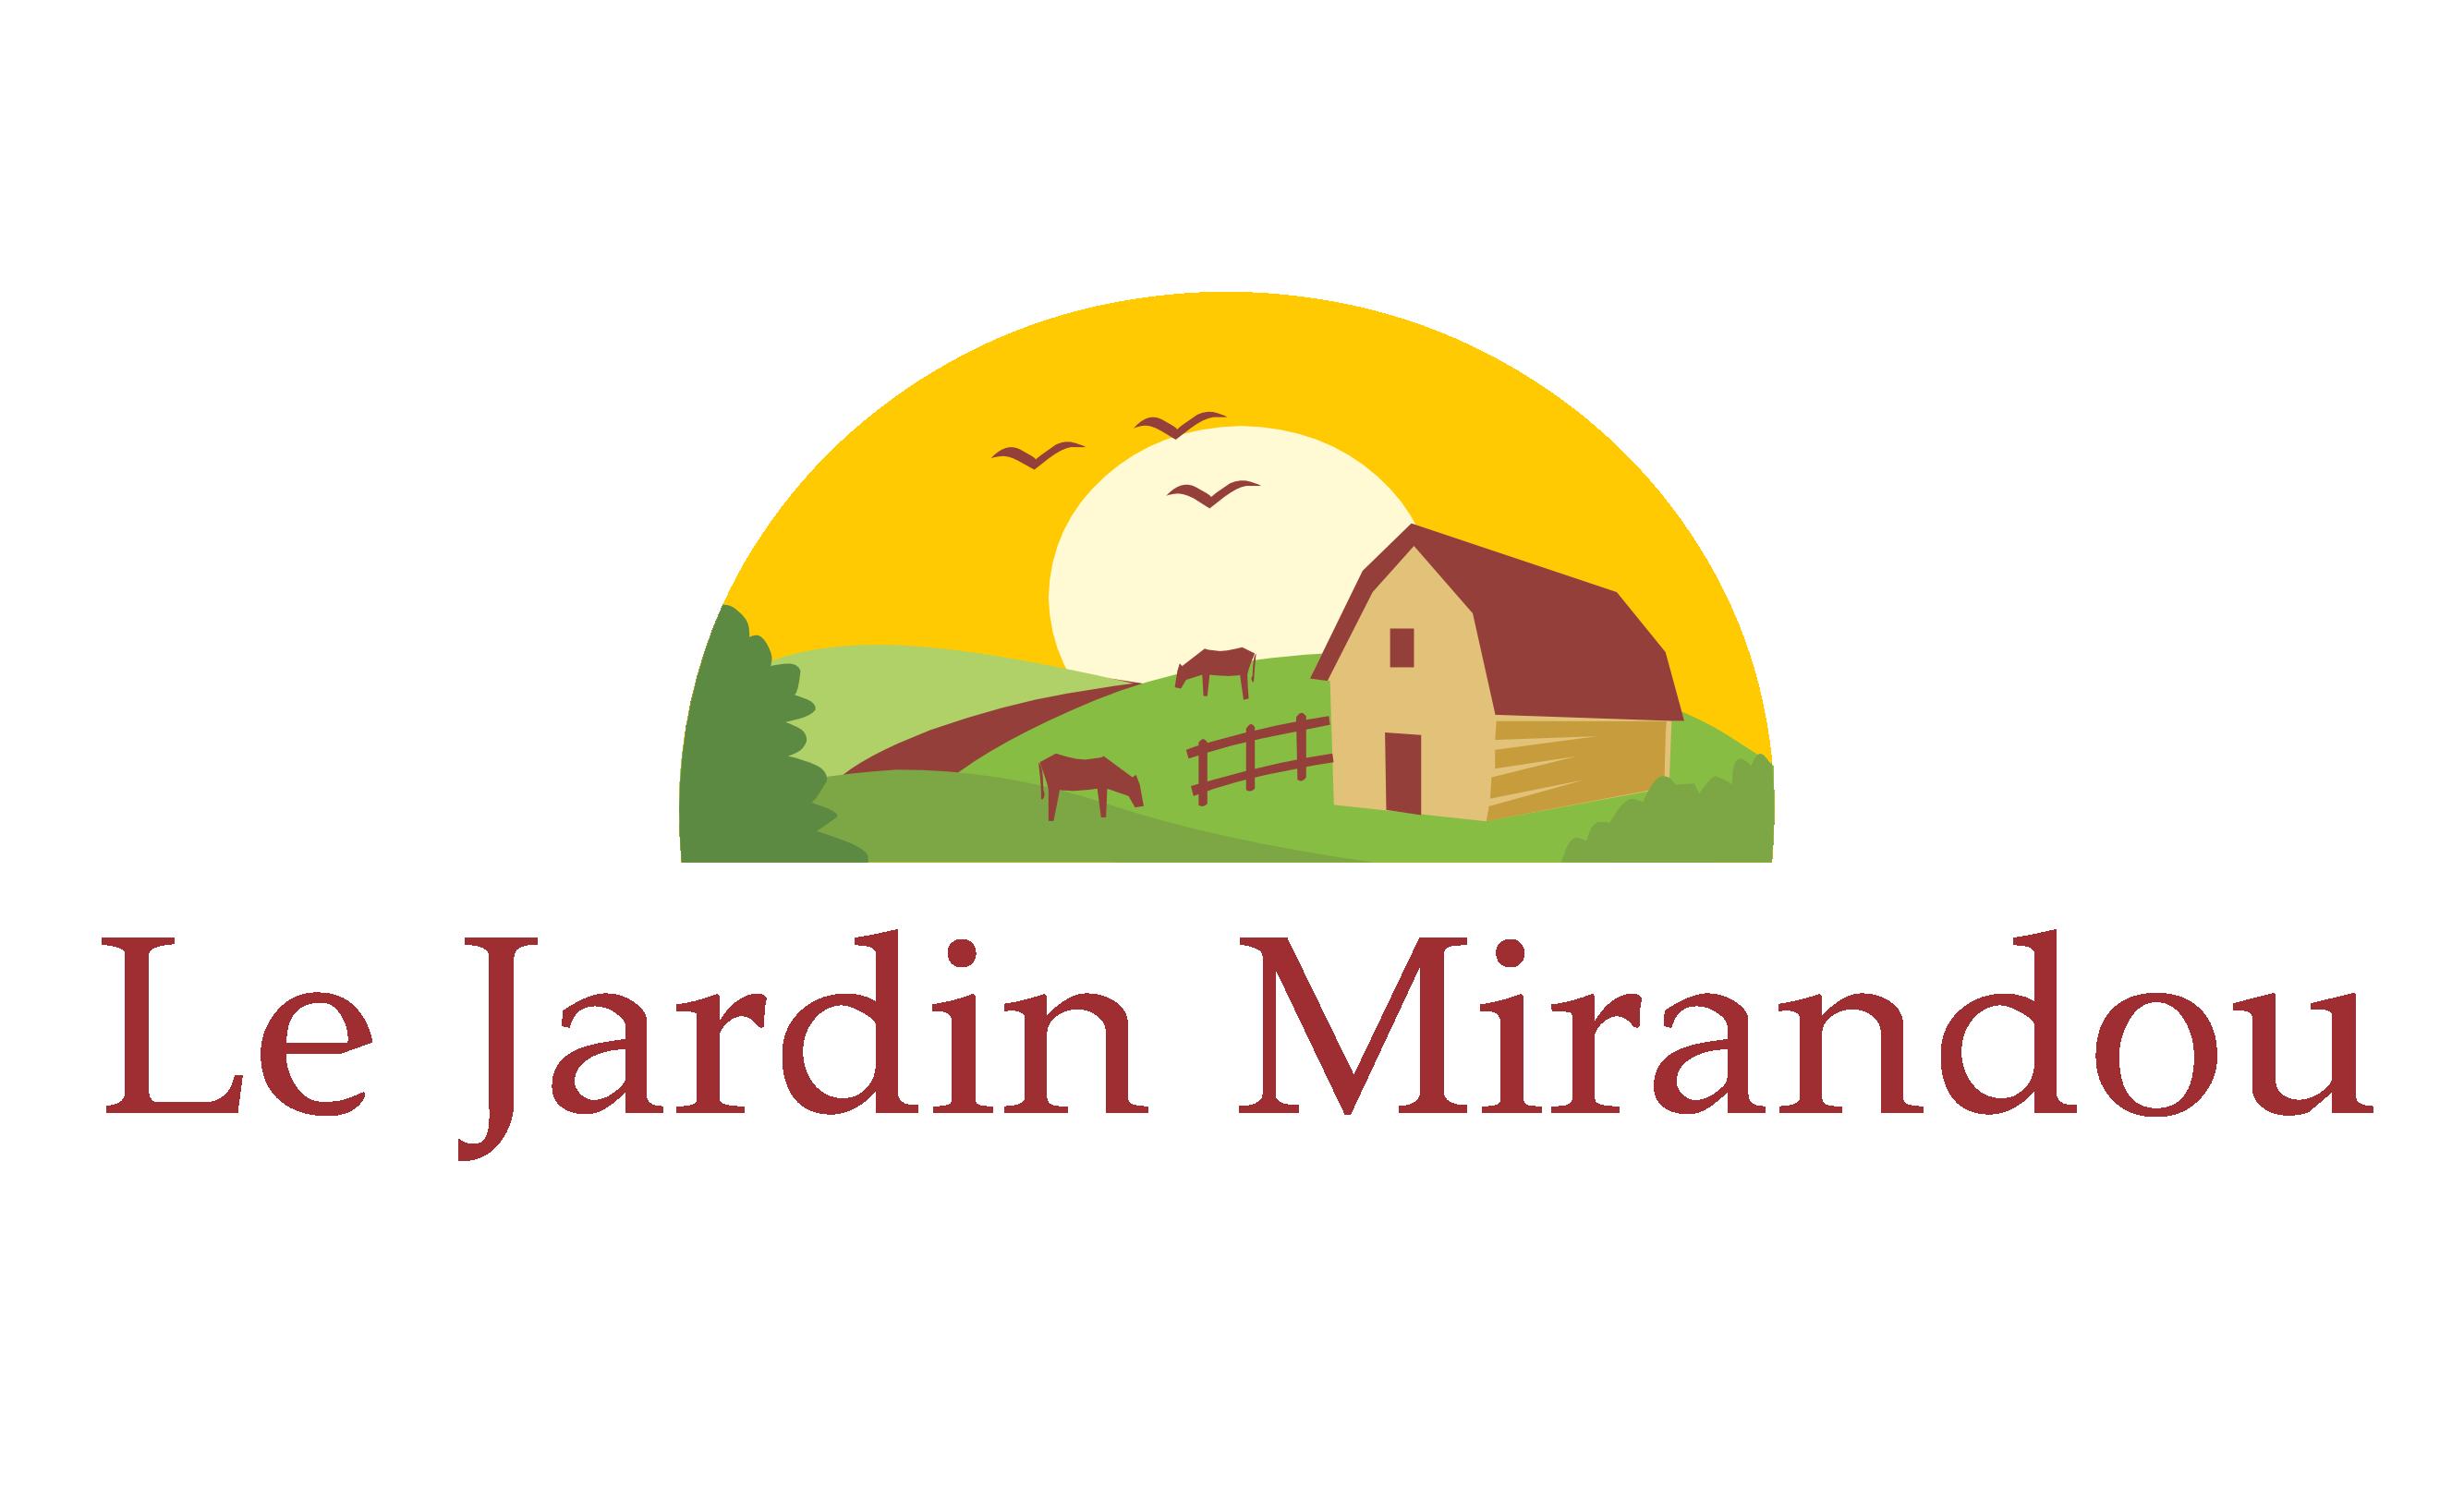 Le Jardin Mirandou